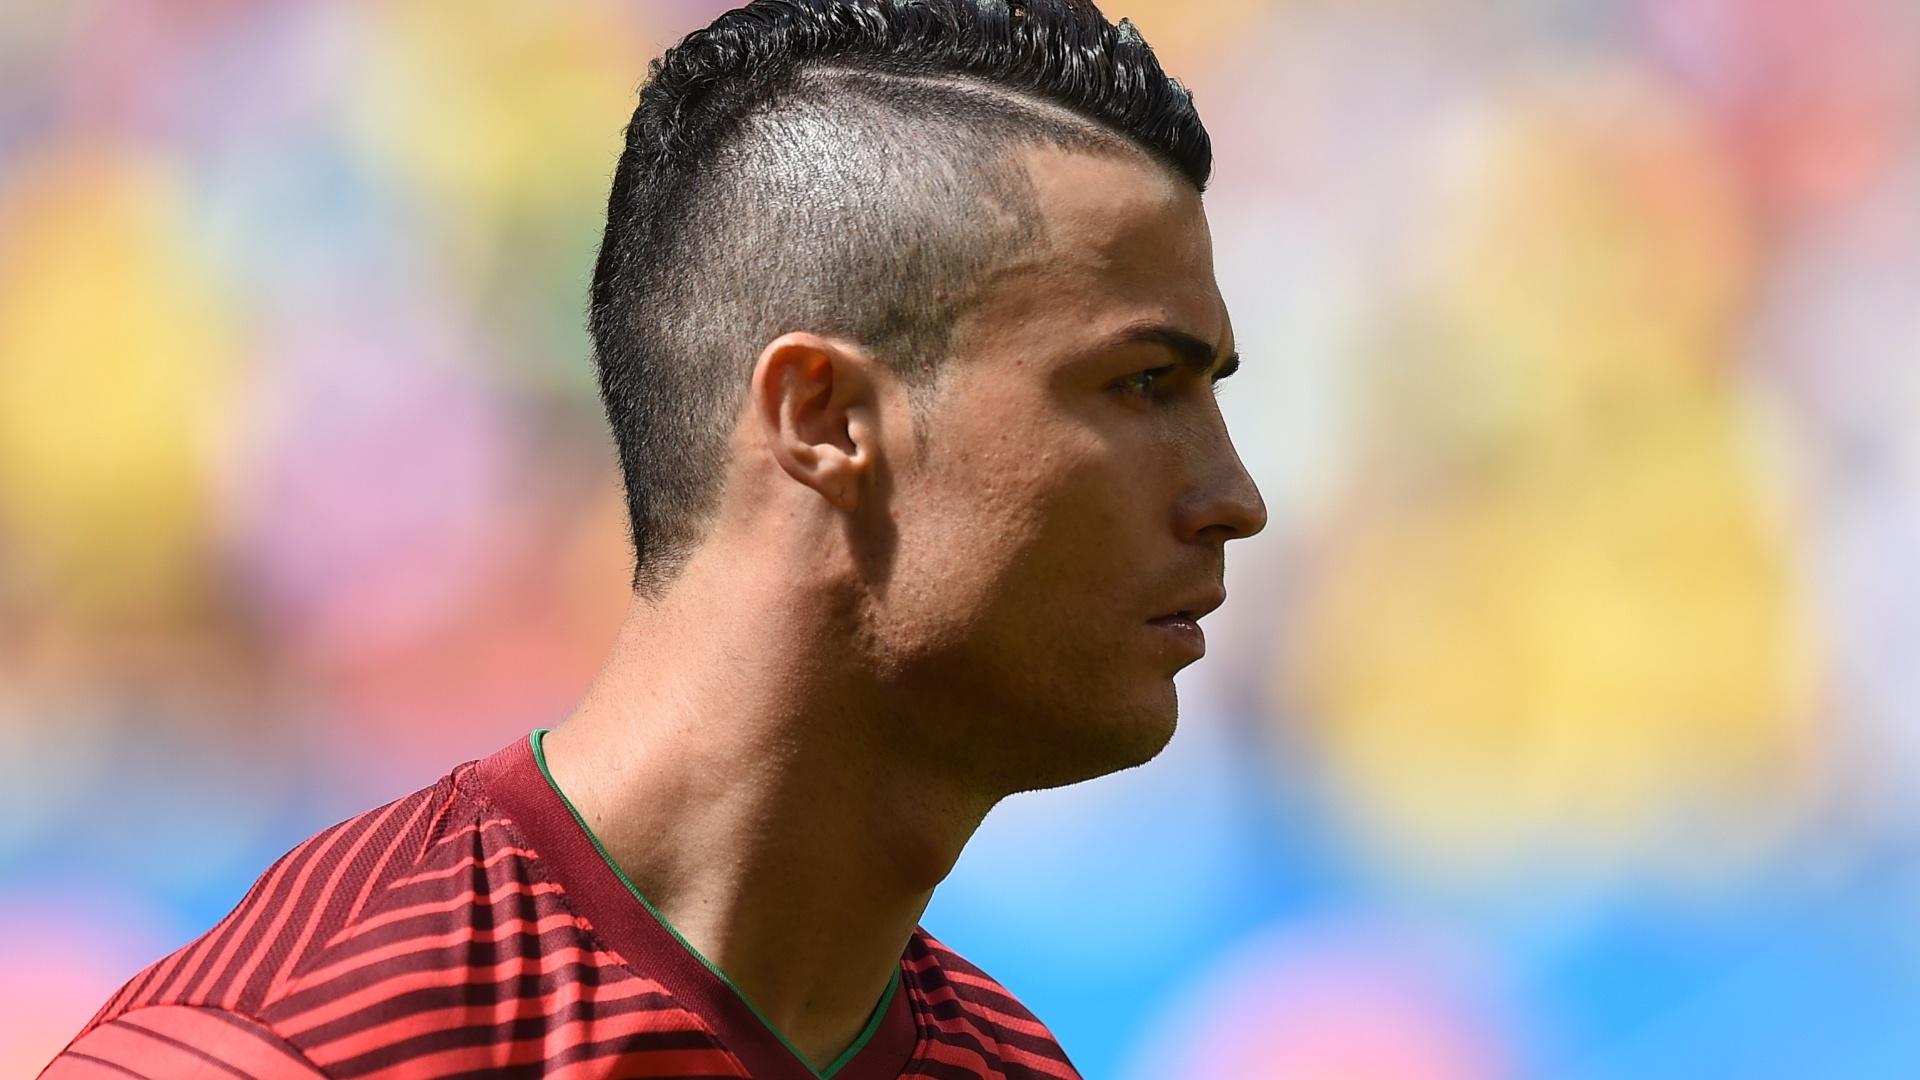 novo corte de cabelo de cristiano ronaldo Quotes